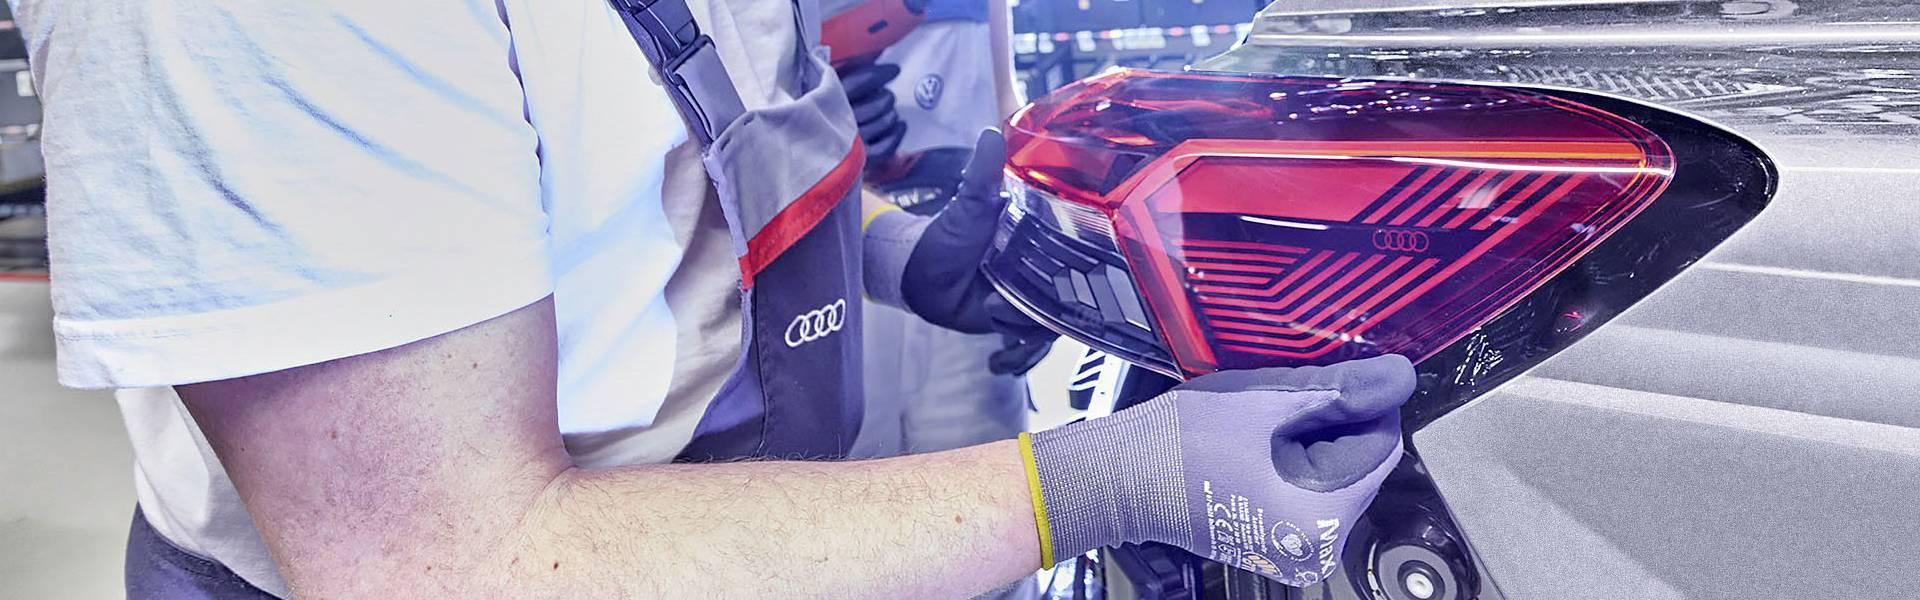 2021-04-audi-start-of-production-bannerproizvodnje modela Audi Q4 e-tron